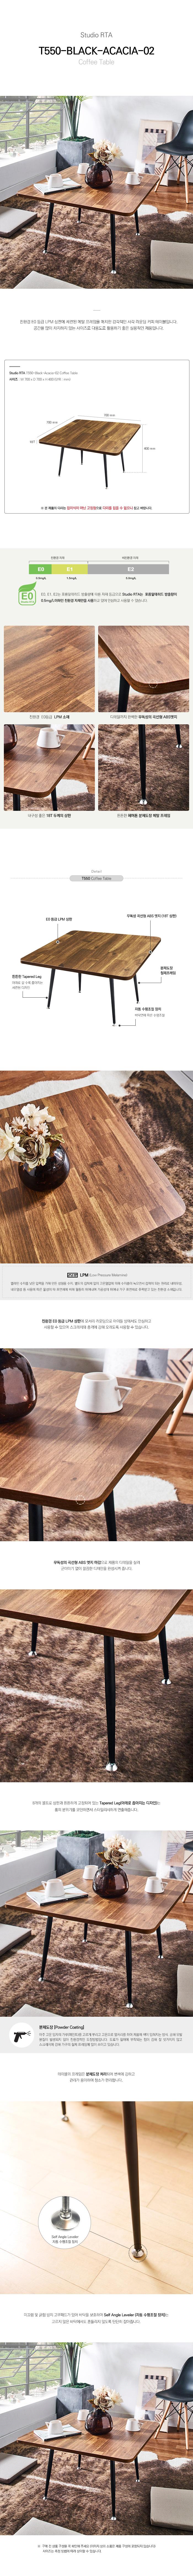 T550-Black-Acacia-02_Coffee-Table_190920